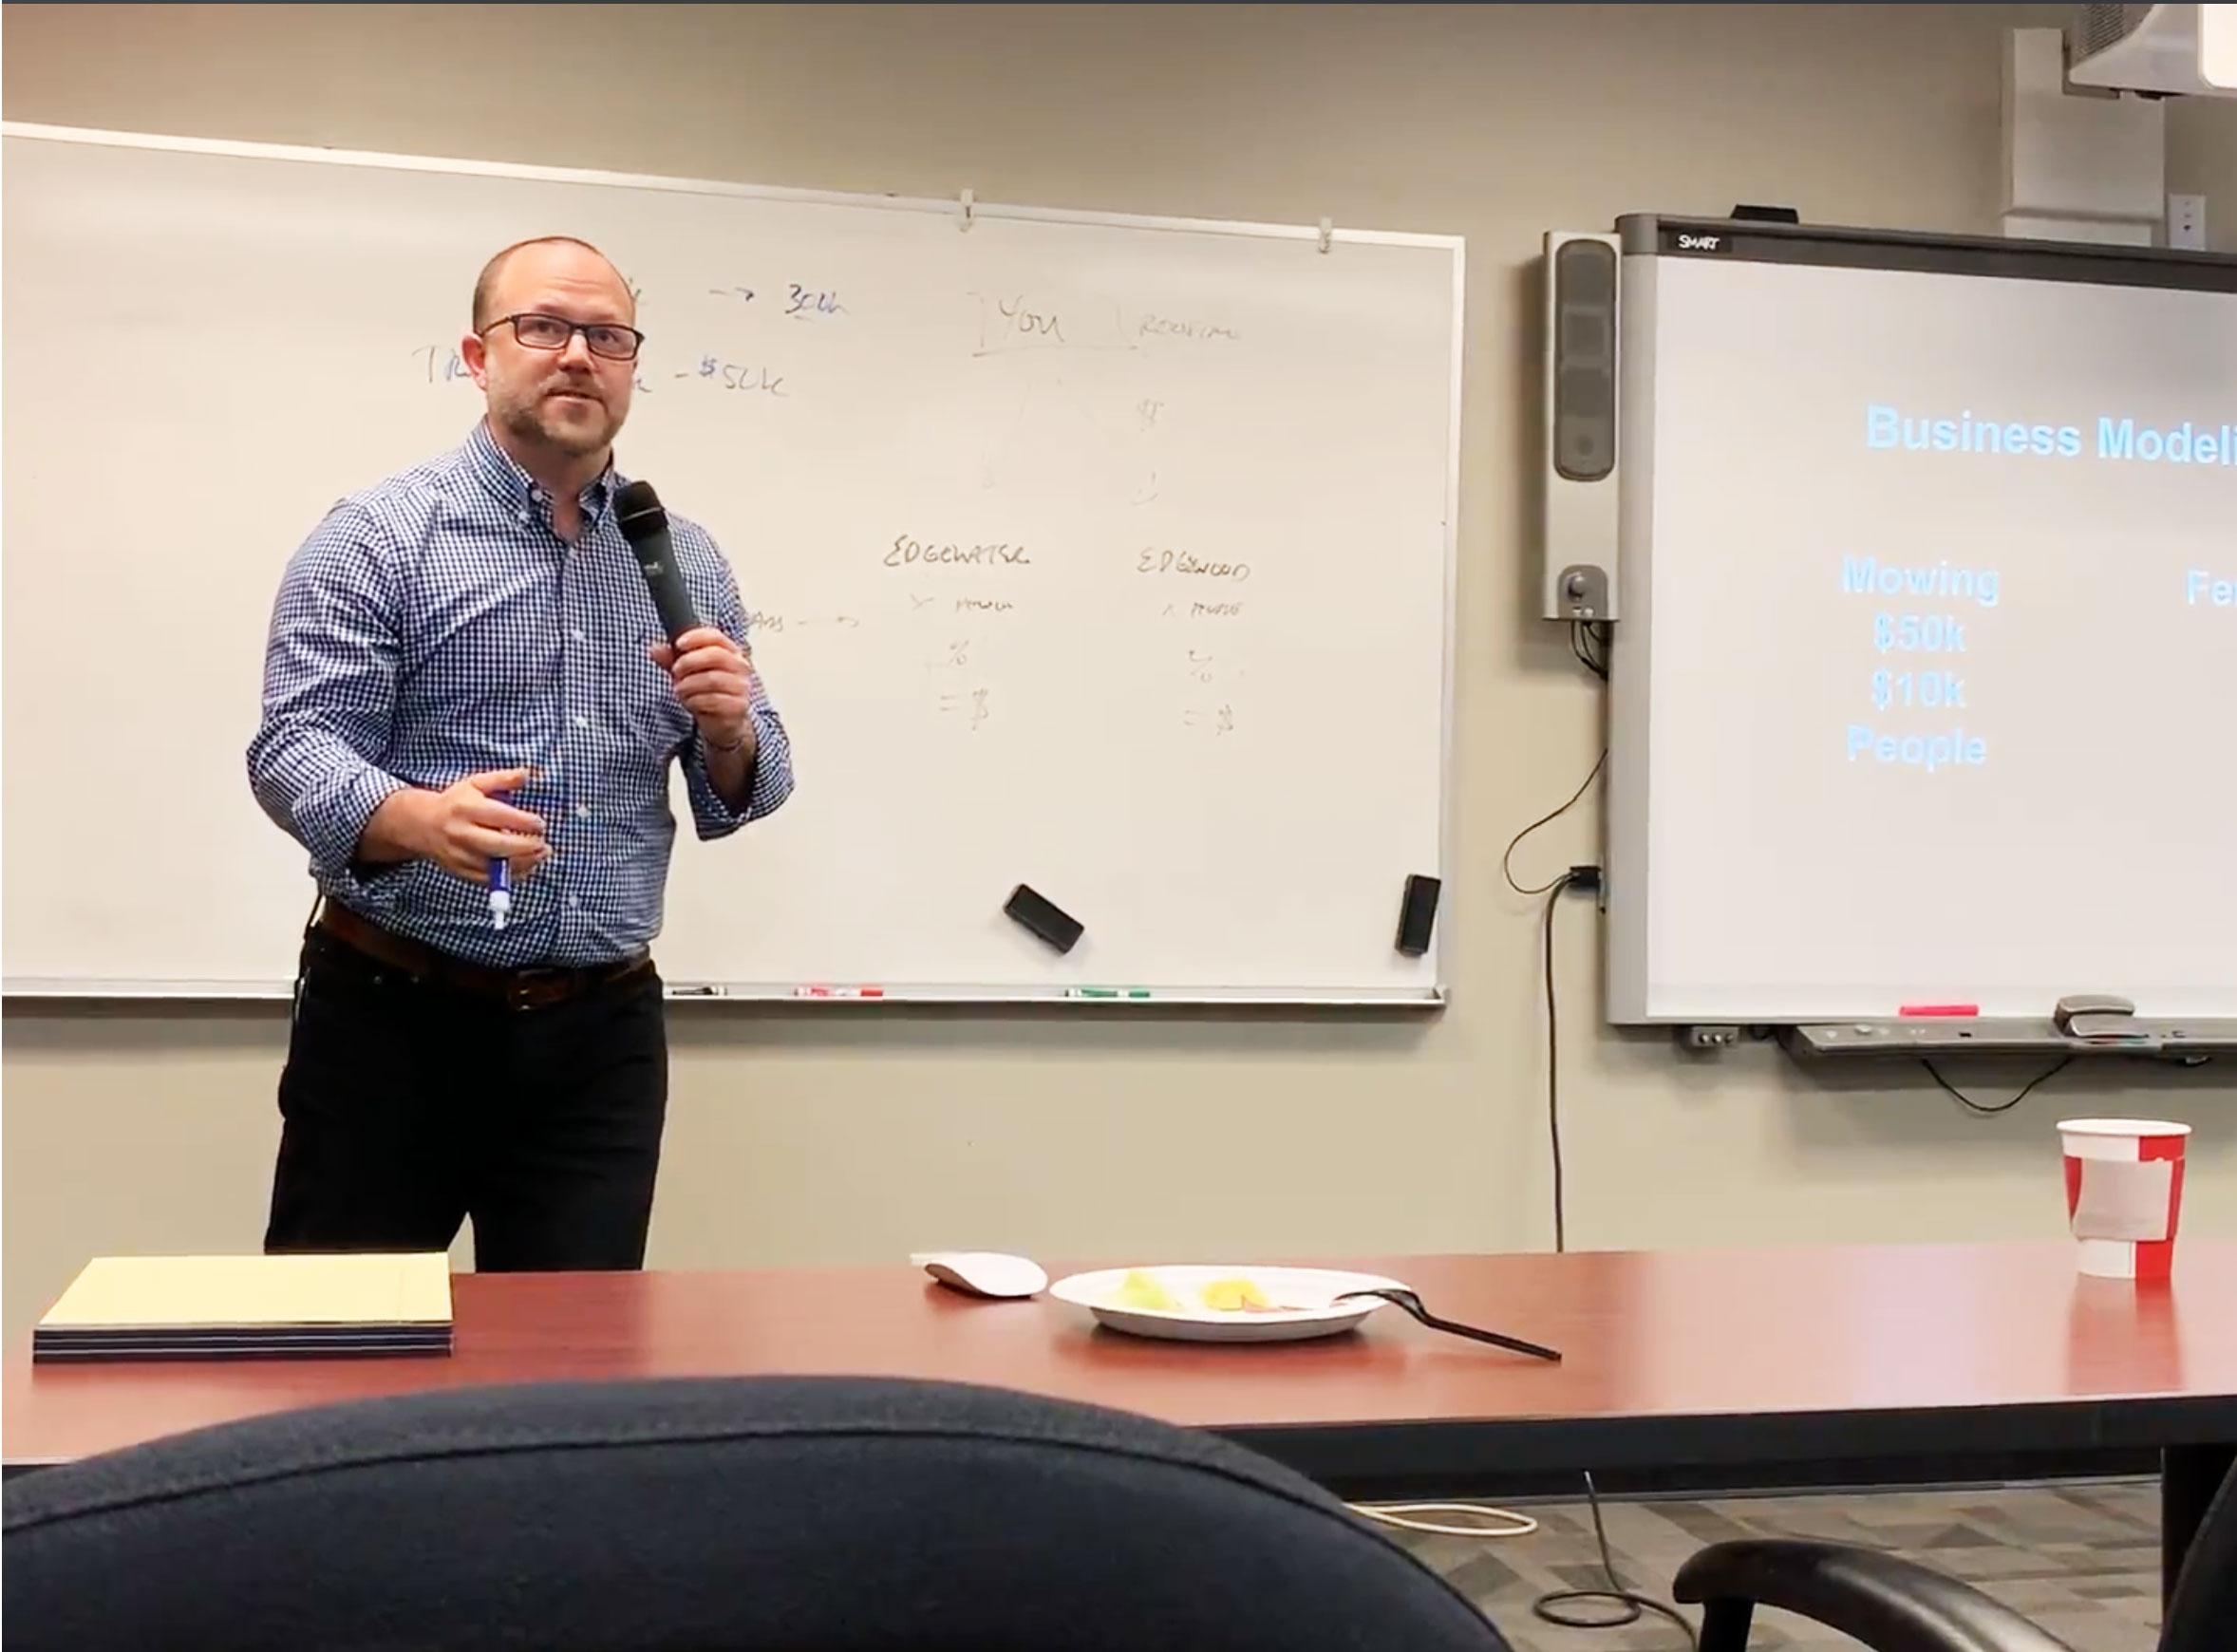 Jason Todd Presentations